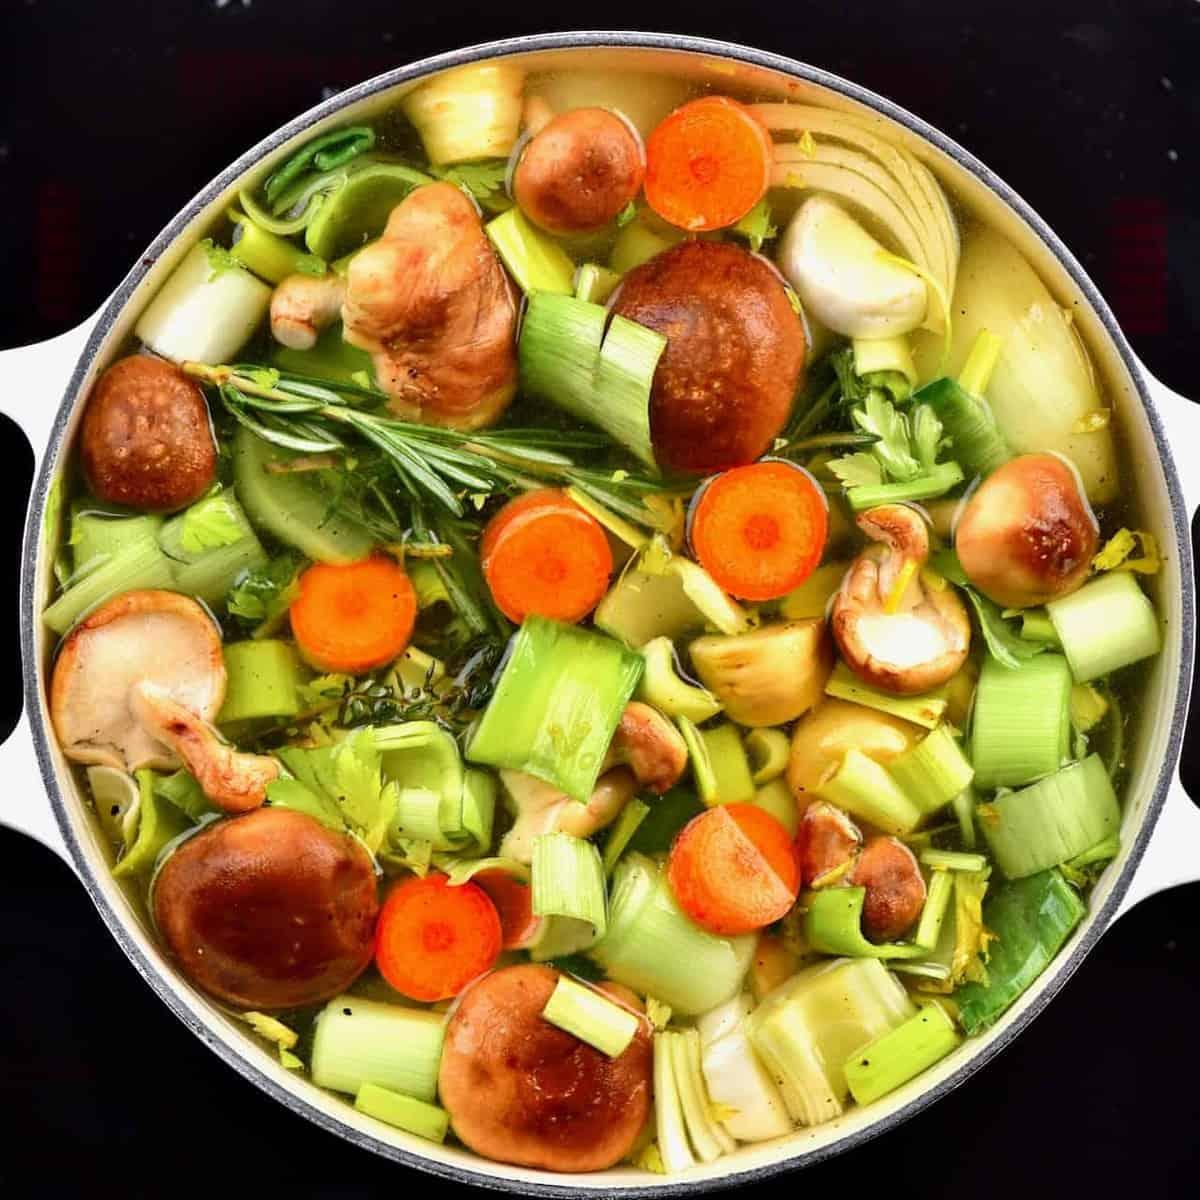 veggies in a large pan